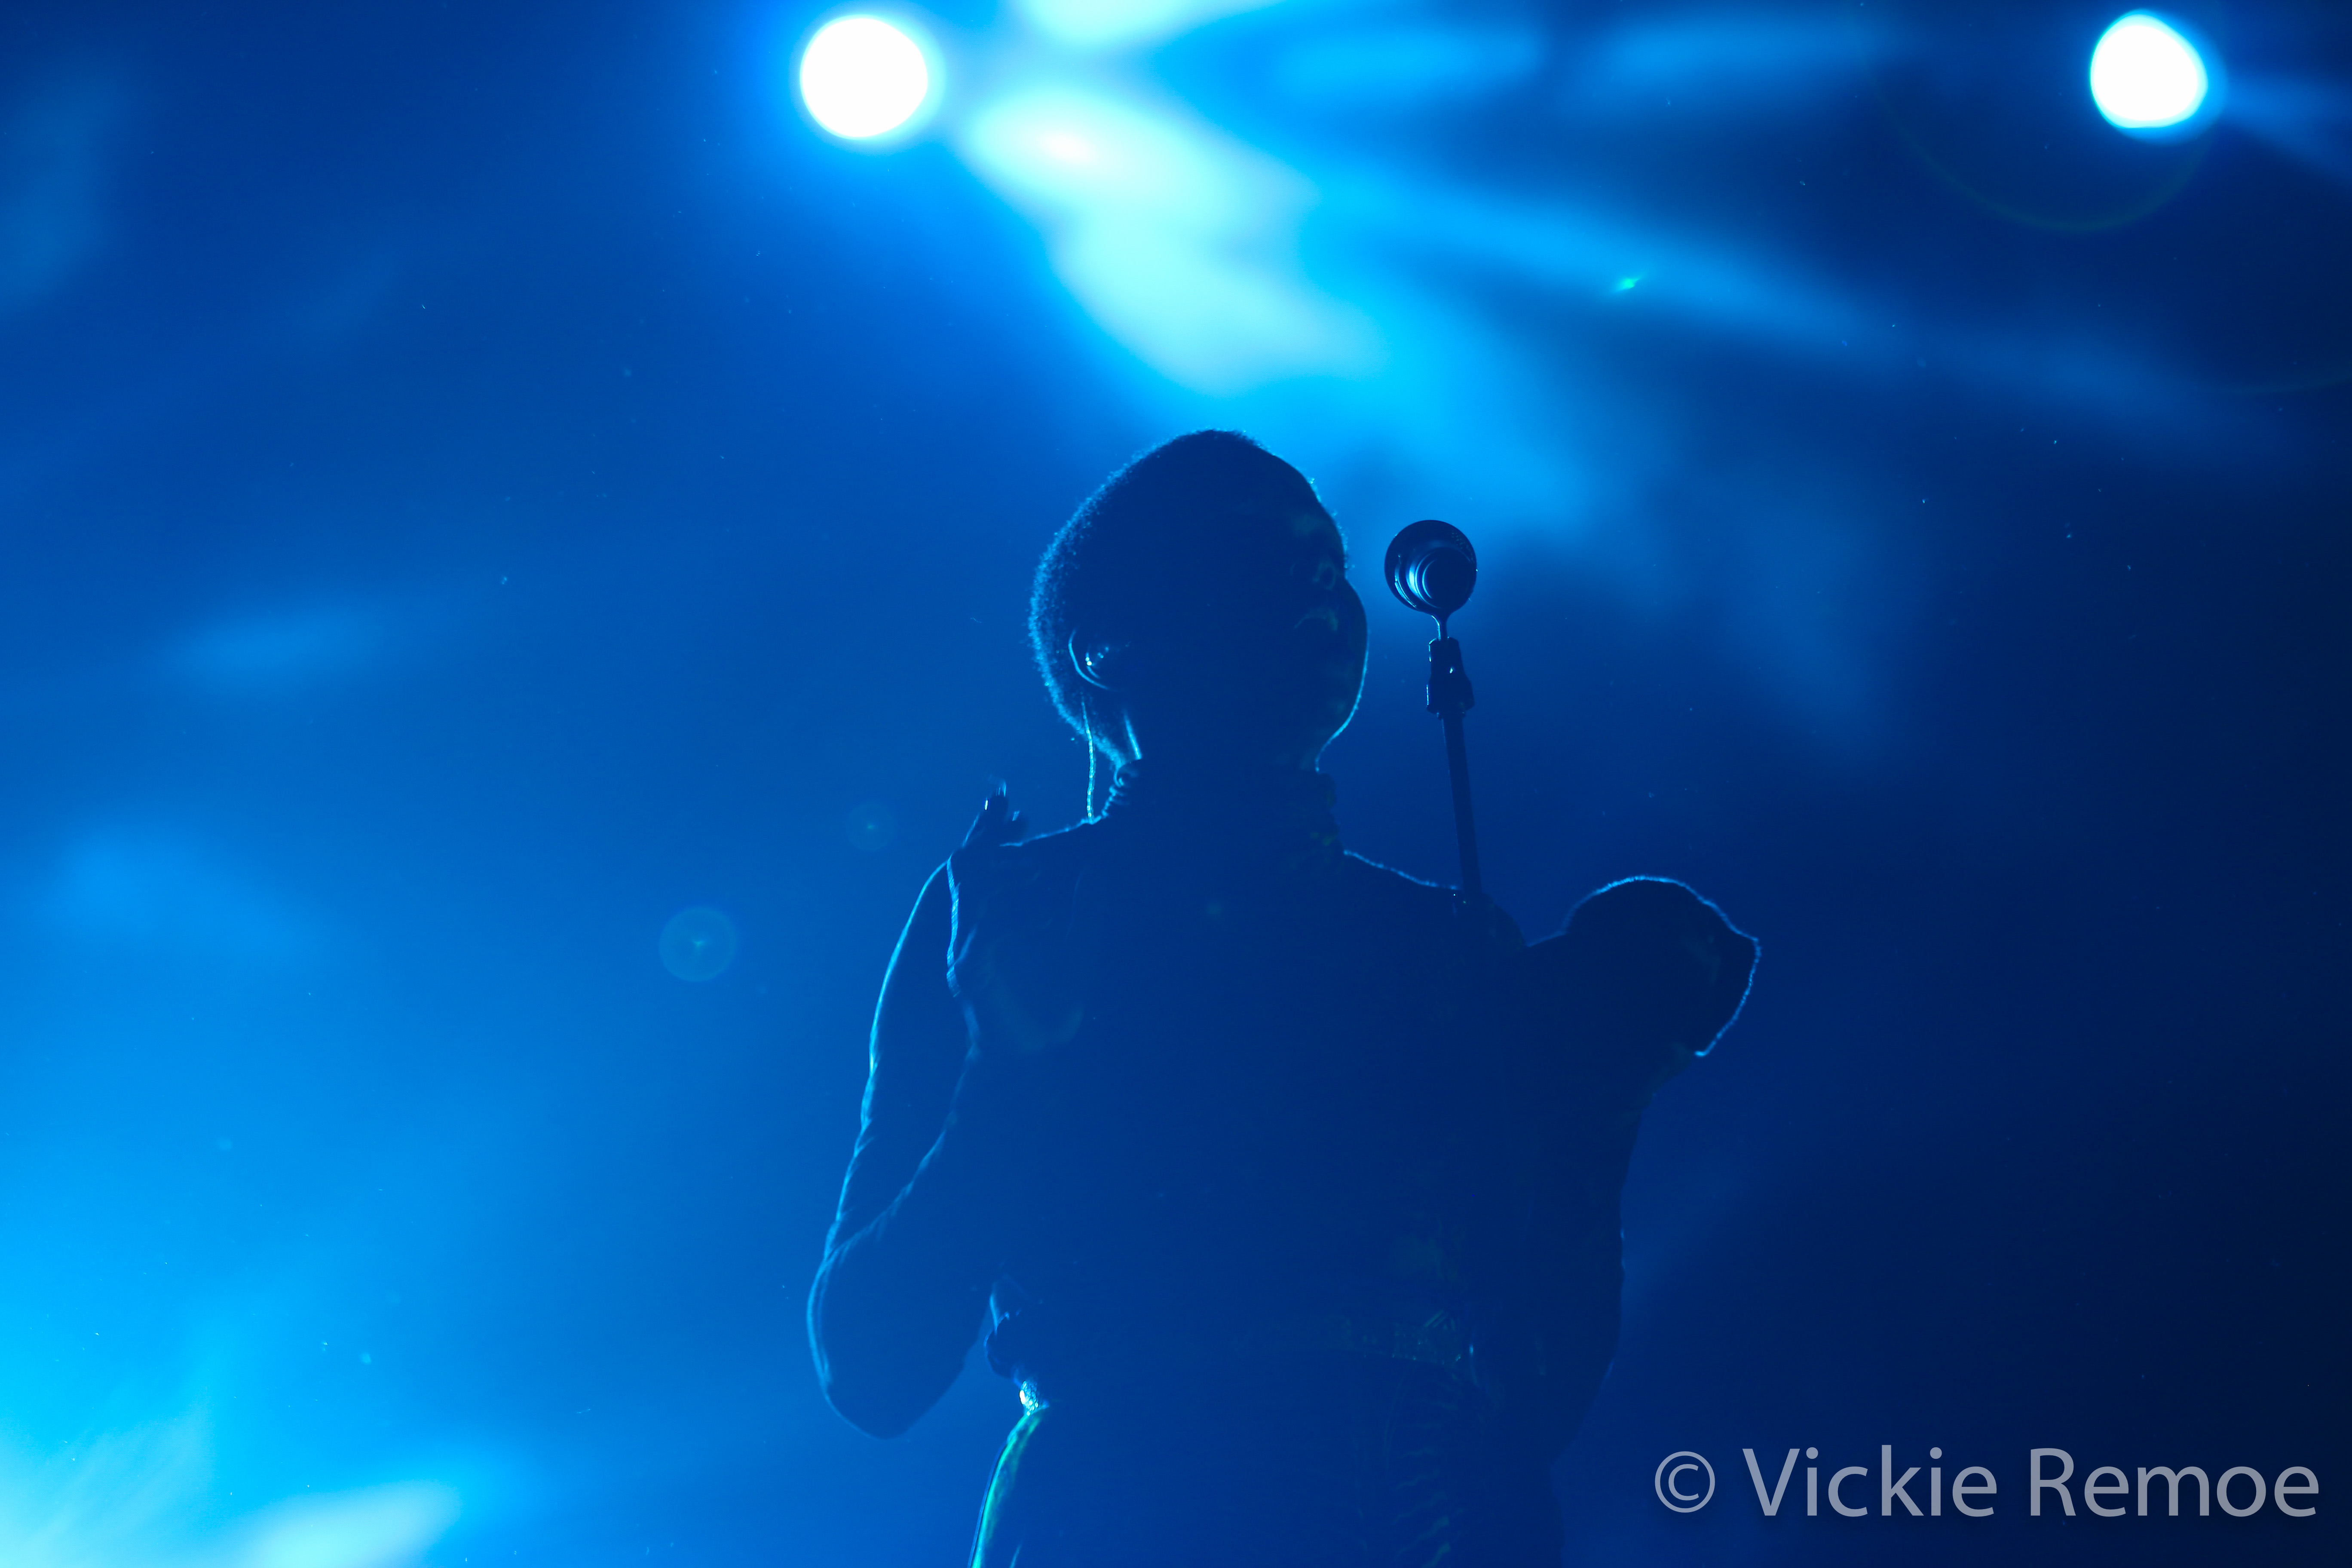 LaurynHillinGhana_Wanlov_BBNZ-Concert_StoneBoy-MissV-2014-25